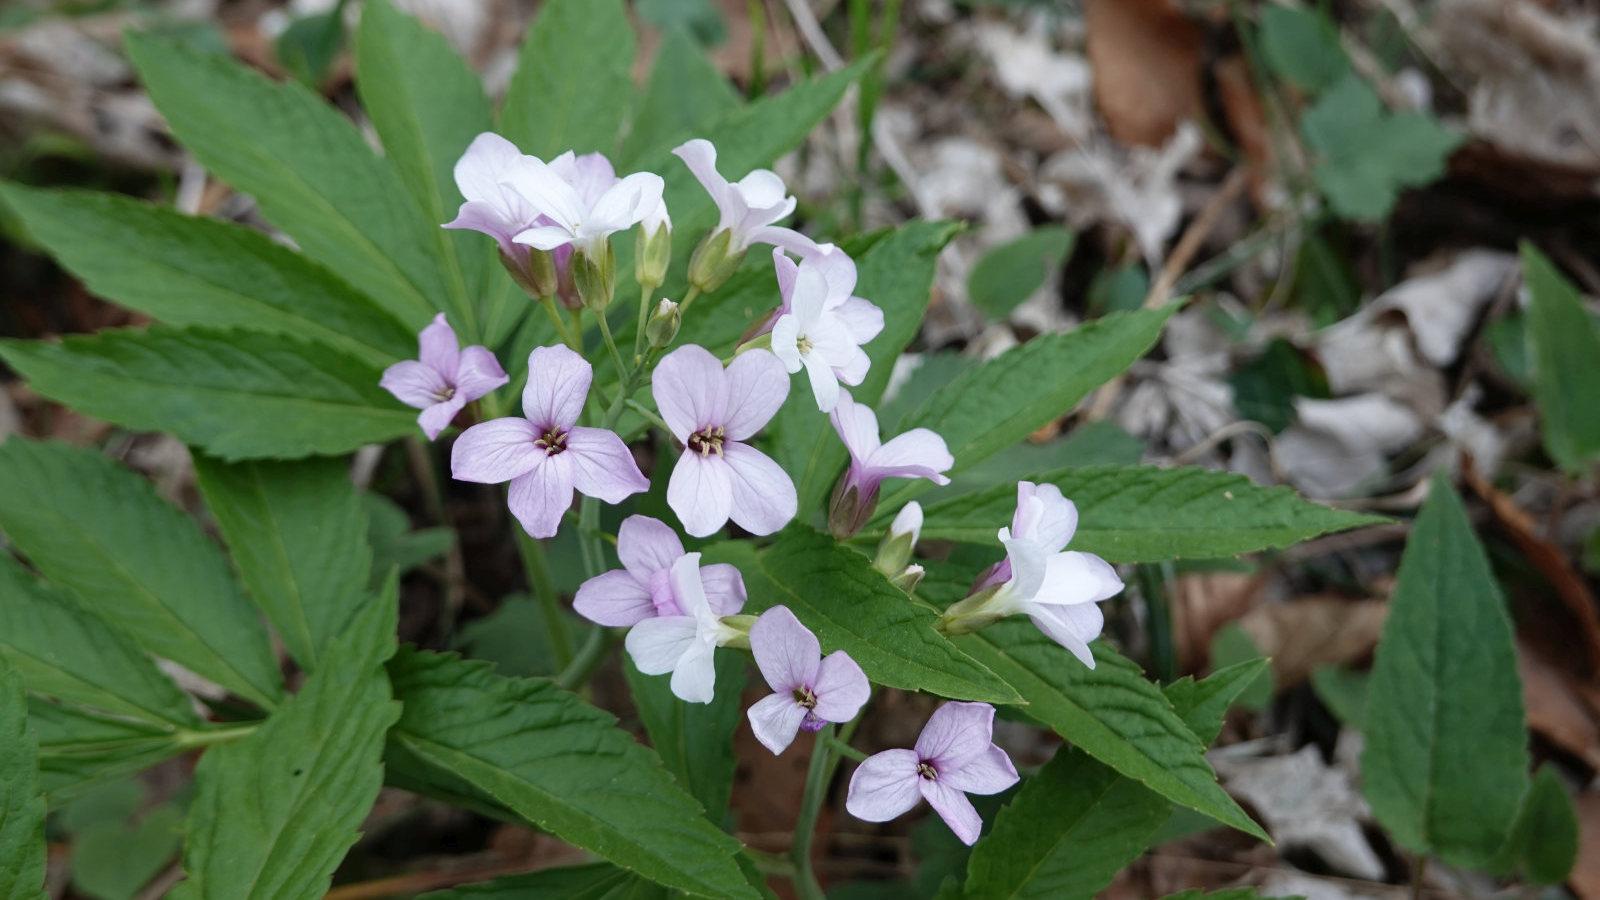 Cardamine à Sept Folioles – Cardamine Heptaphylla